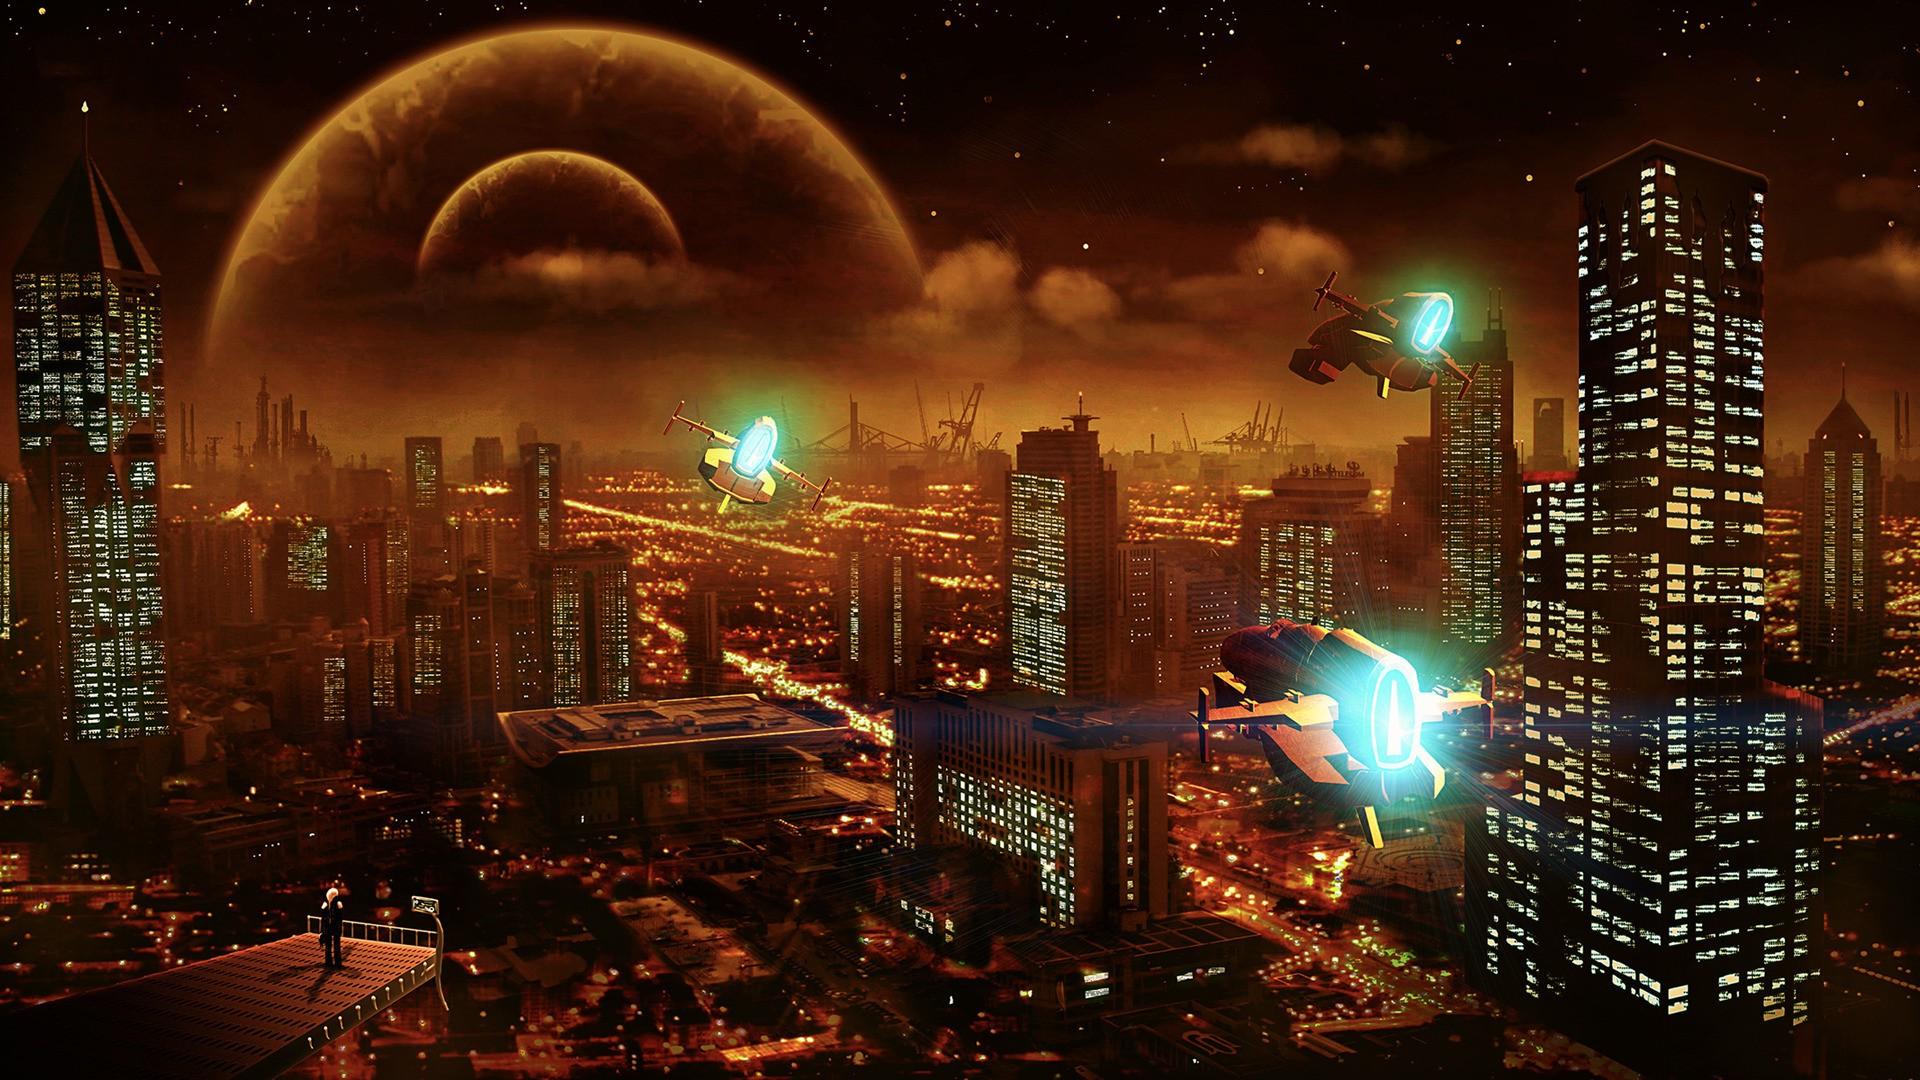 Night Wallpaper No Logo By Ualgreymon On Deviantart: Artwork, Futuristic, Spaceship, City, Digital Art, Sky